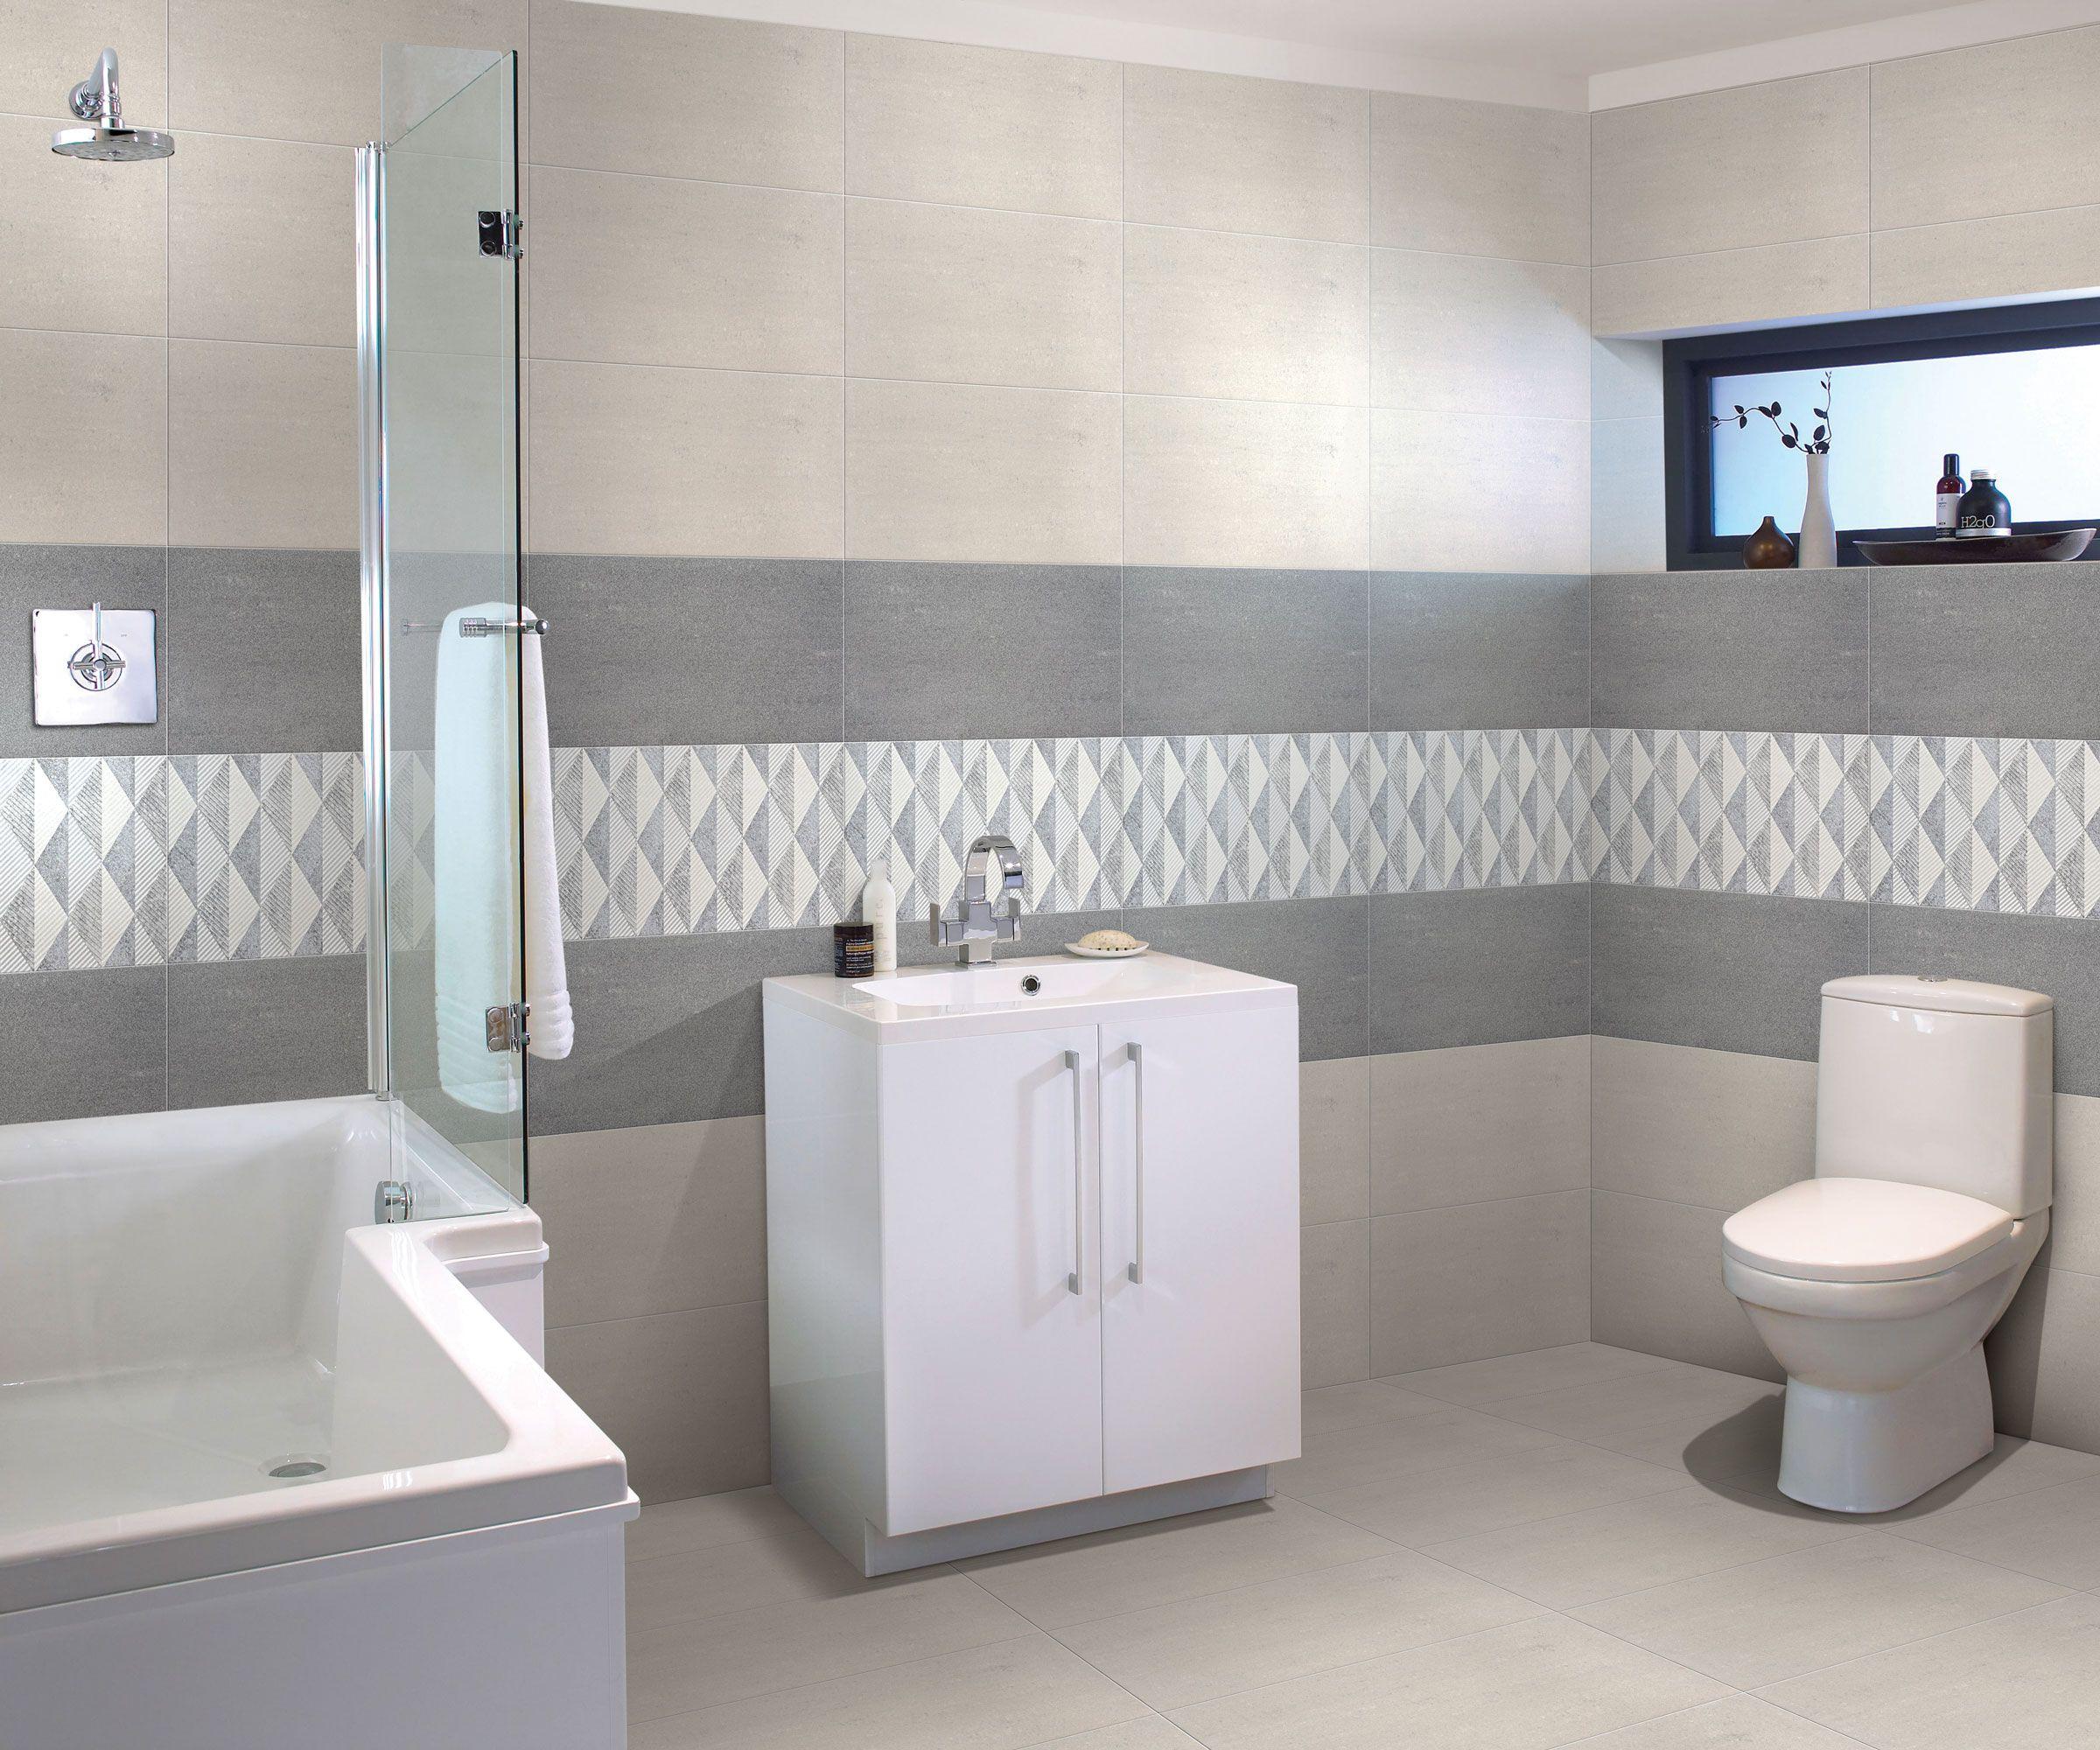 Tiles Nz Online | Tile Design Ideas